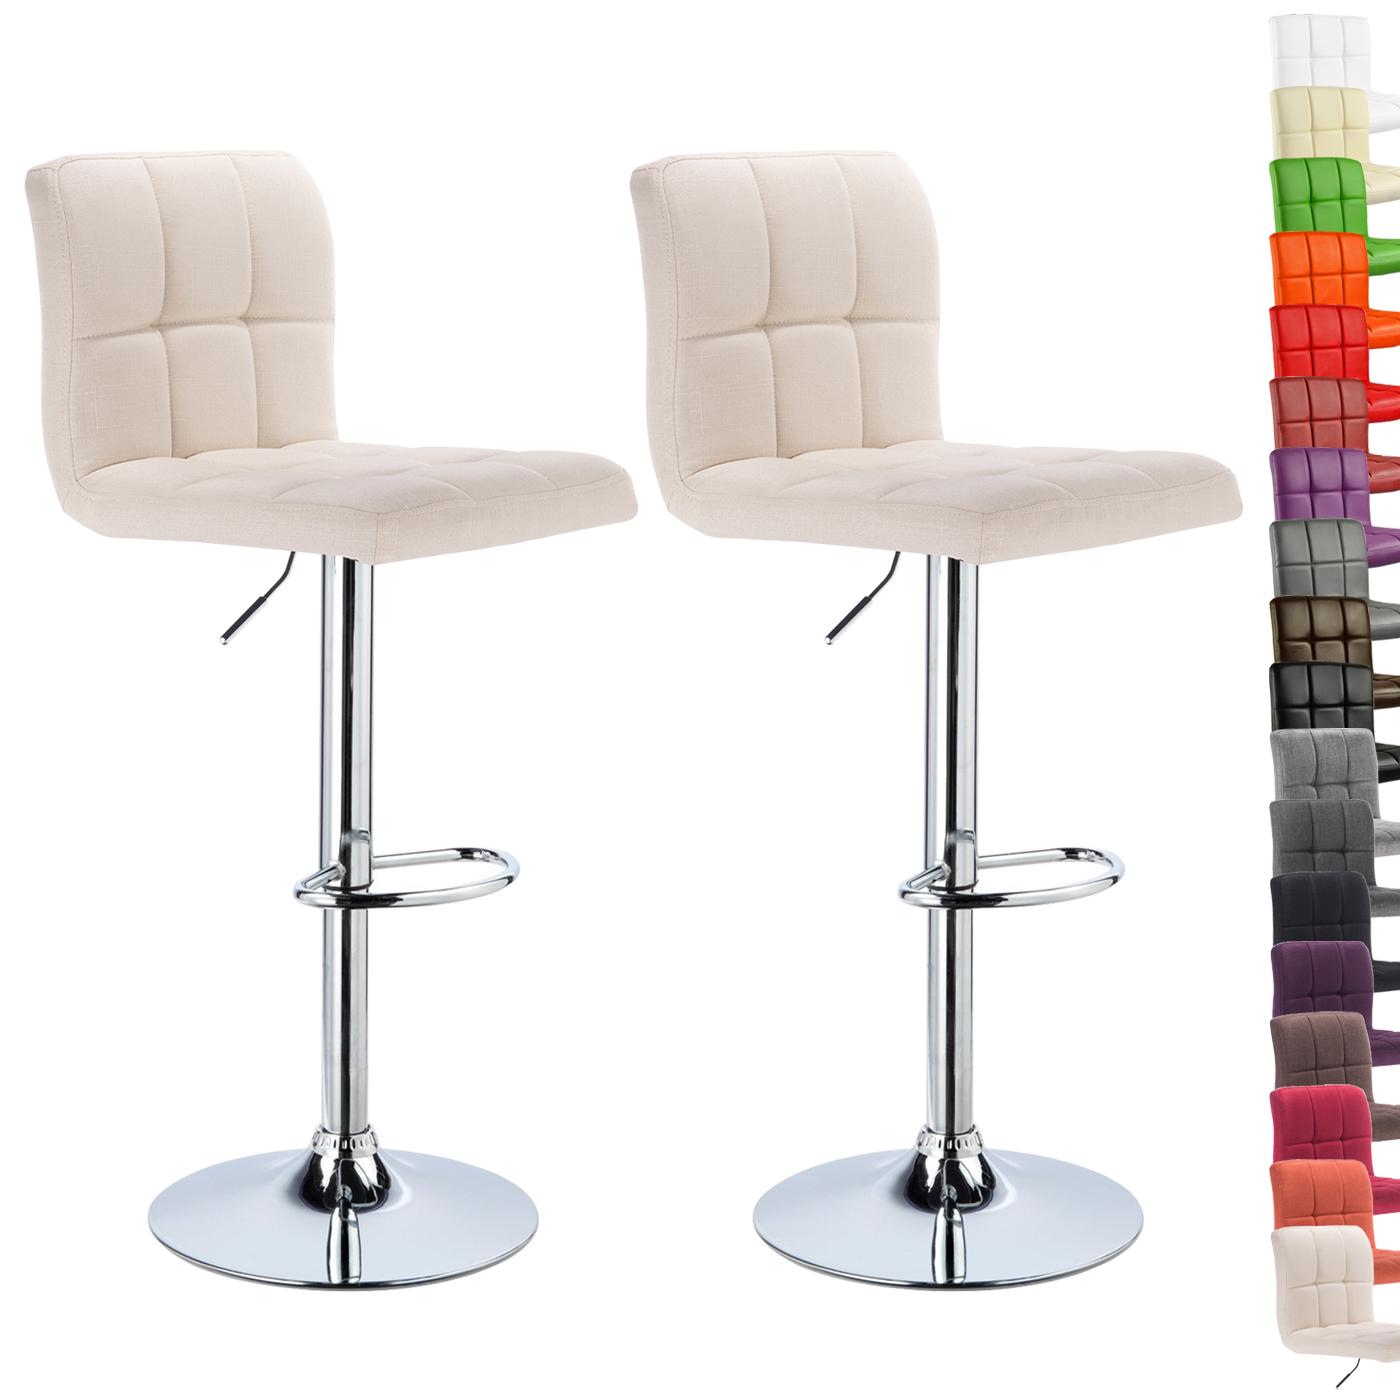 hocker barhocker tresen kunstleder gepolstert barstuhl. Black Bedroom Furniture Sets. Home Design Ideas